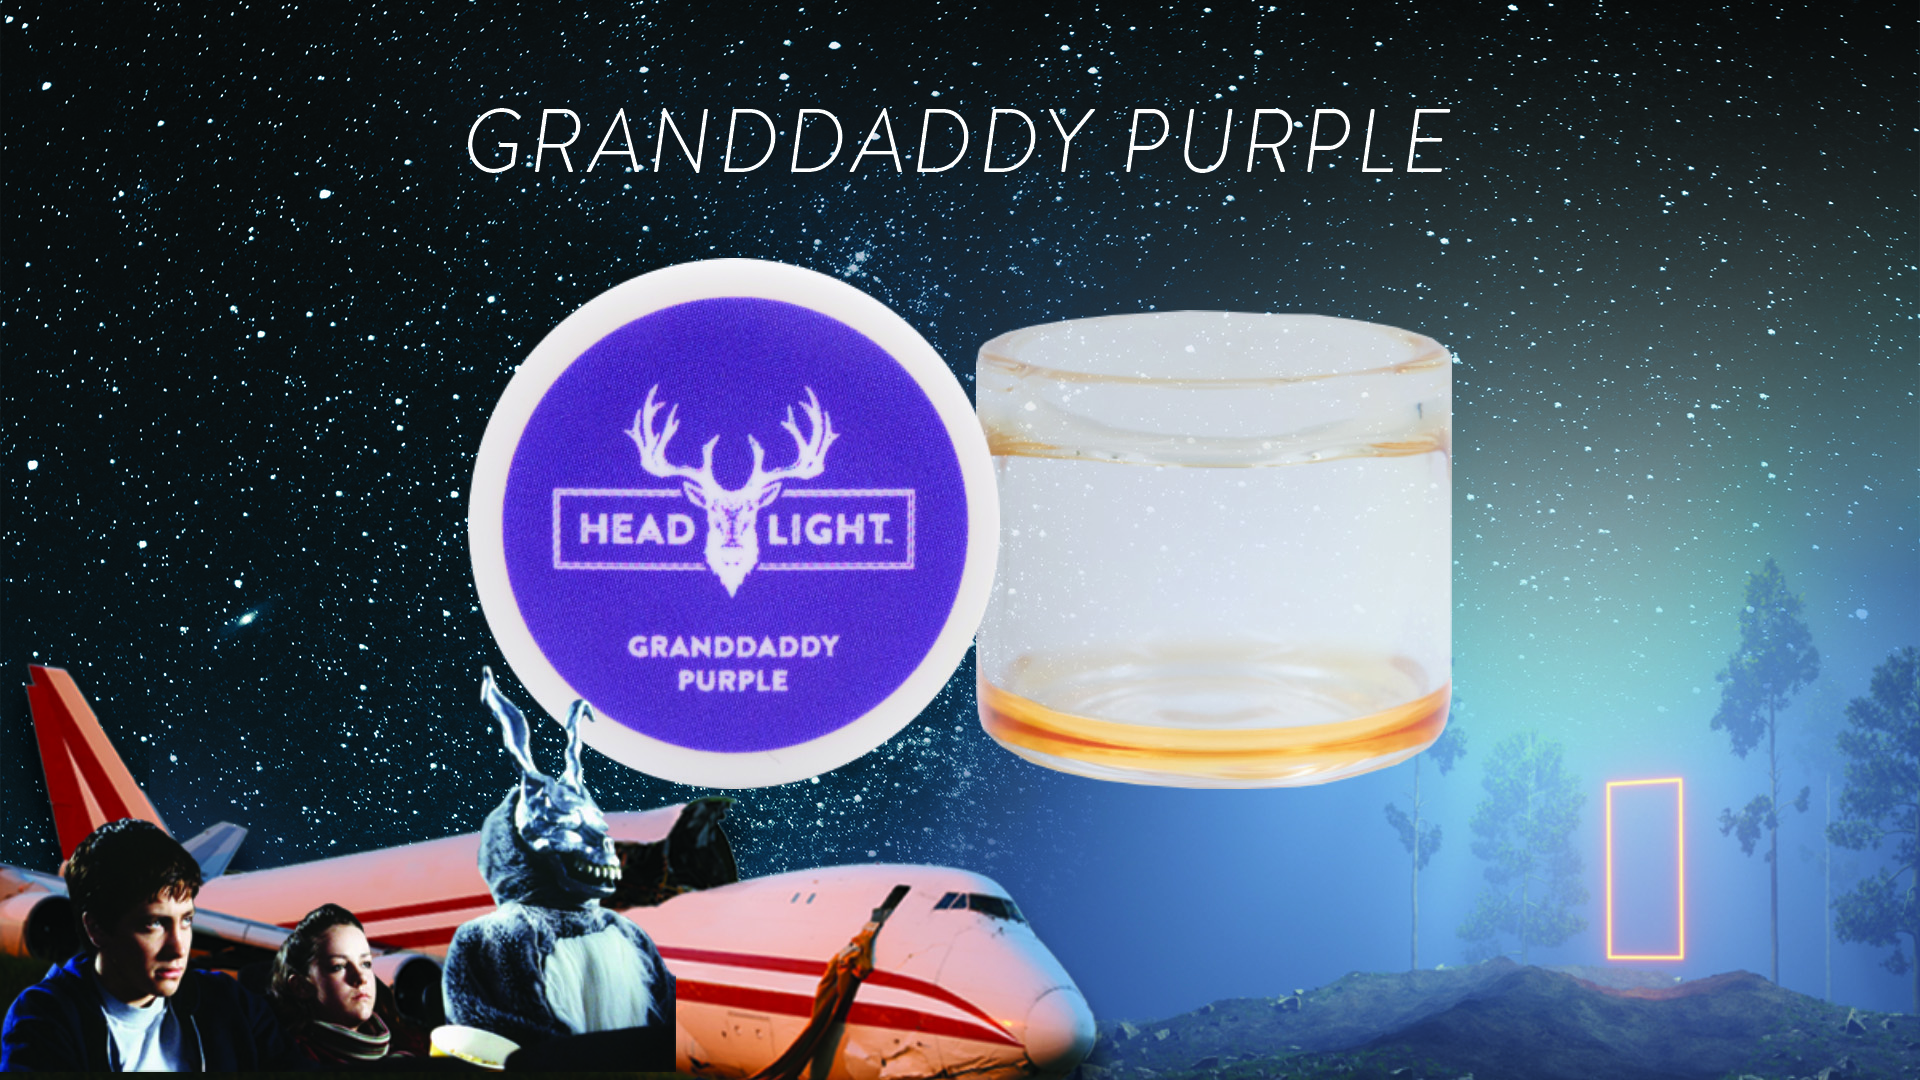 Headlight-Cannabis-Granddaddy-Purple-Far-Out-Films.jpg